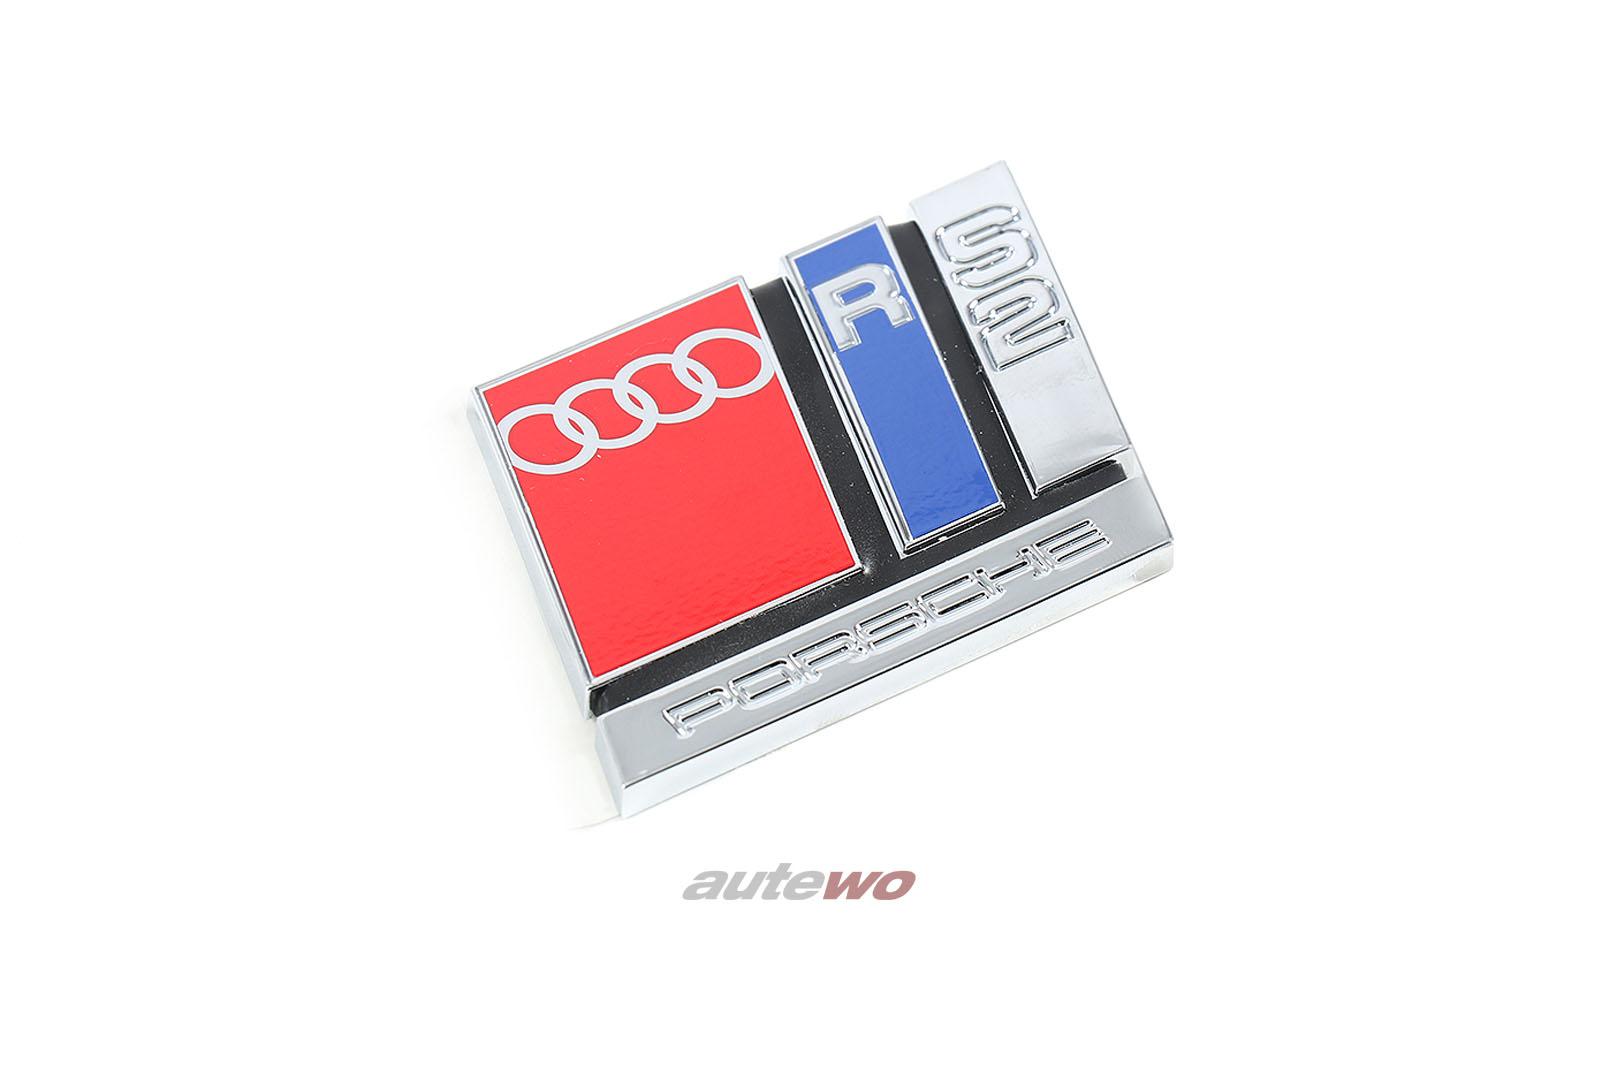 8A0853735A NEU&ORIGINAL Audi RS2 P1 Emblem/Schriftzug Heckklappe